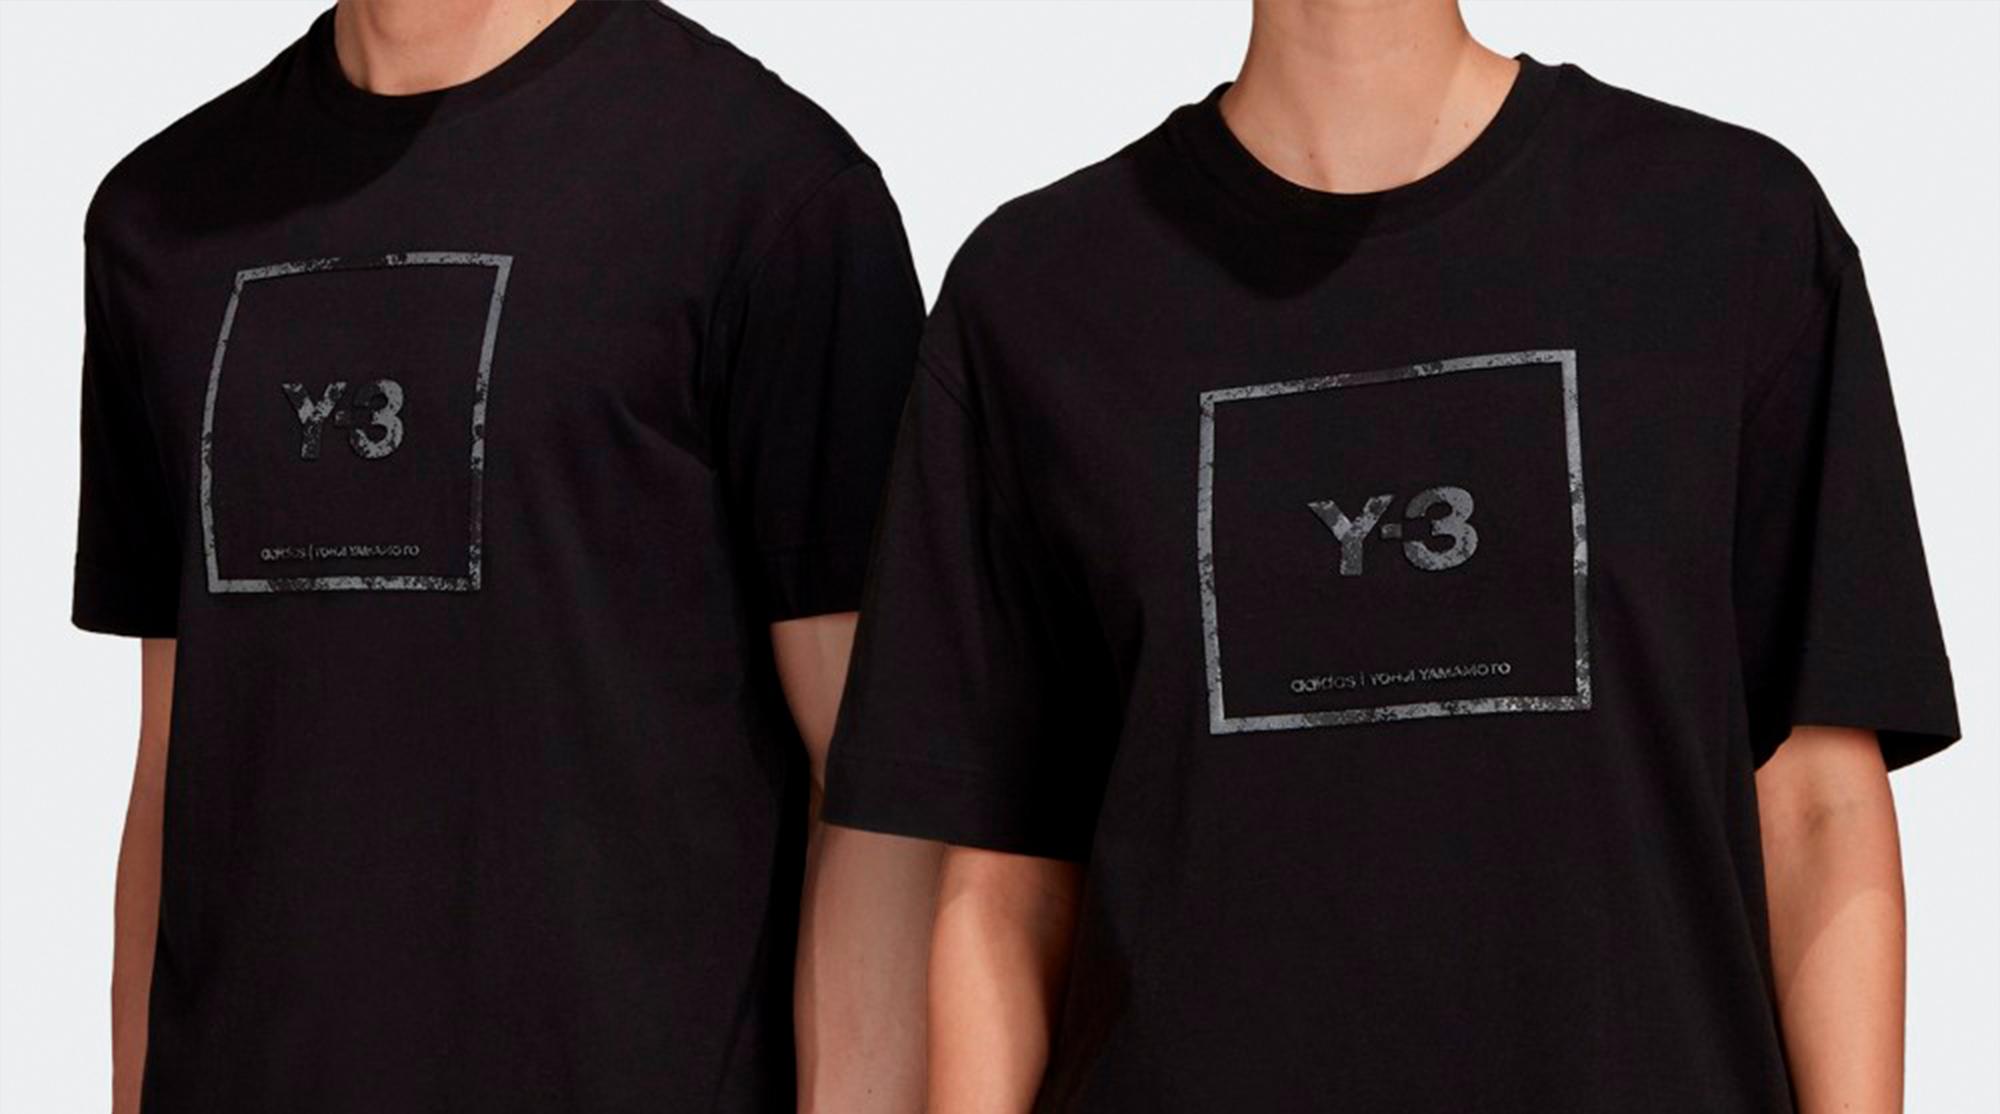 Y-3: 购买正价货品满港币6,000元可享九五折 @Fa...